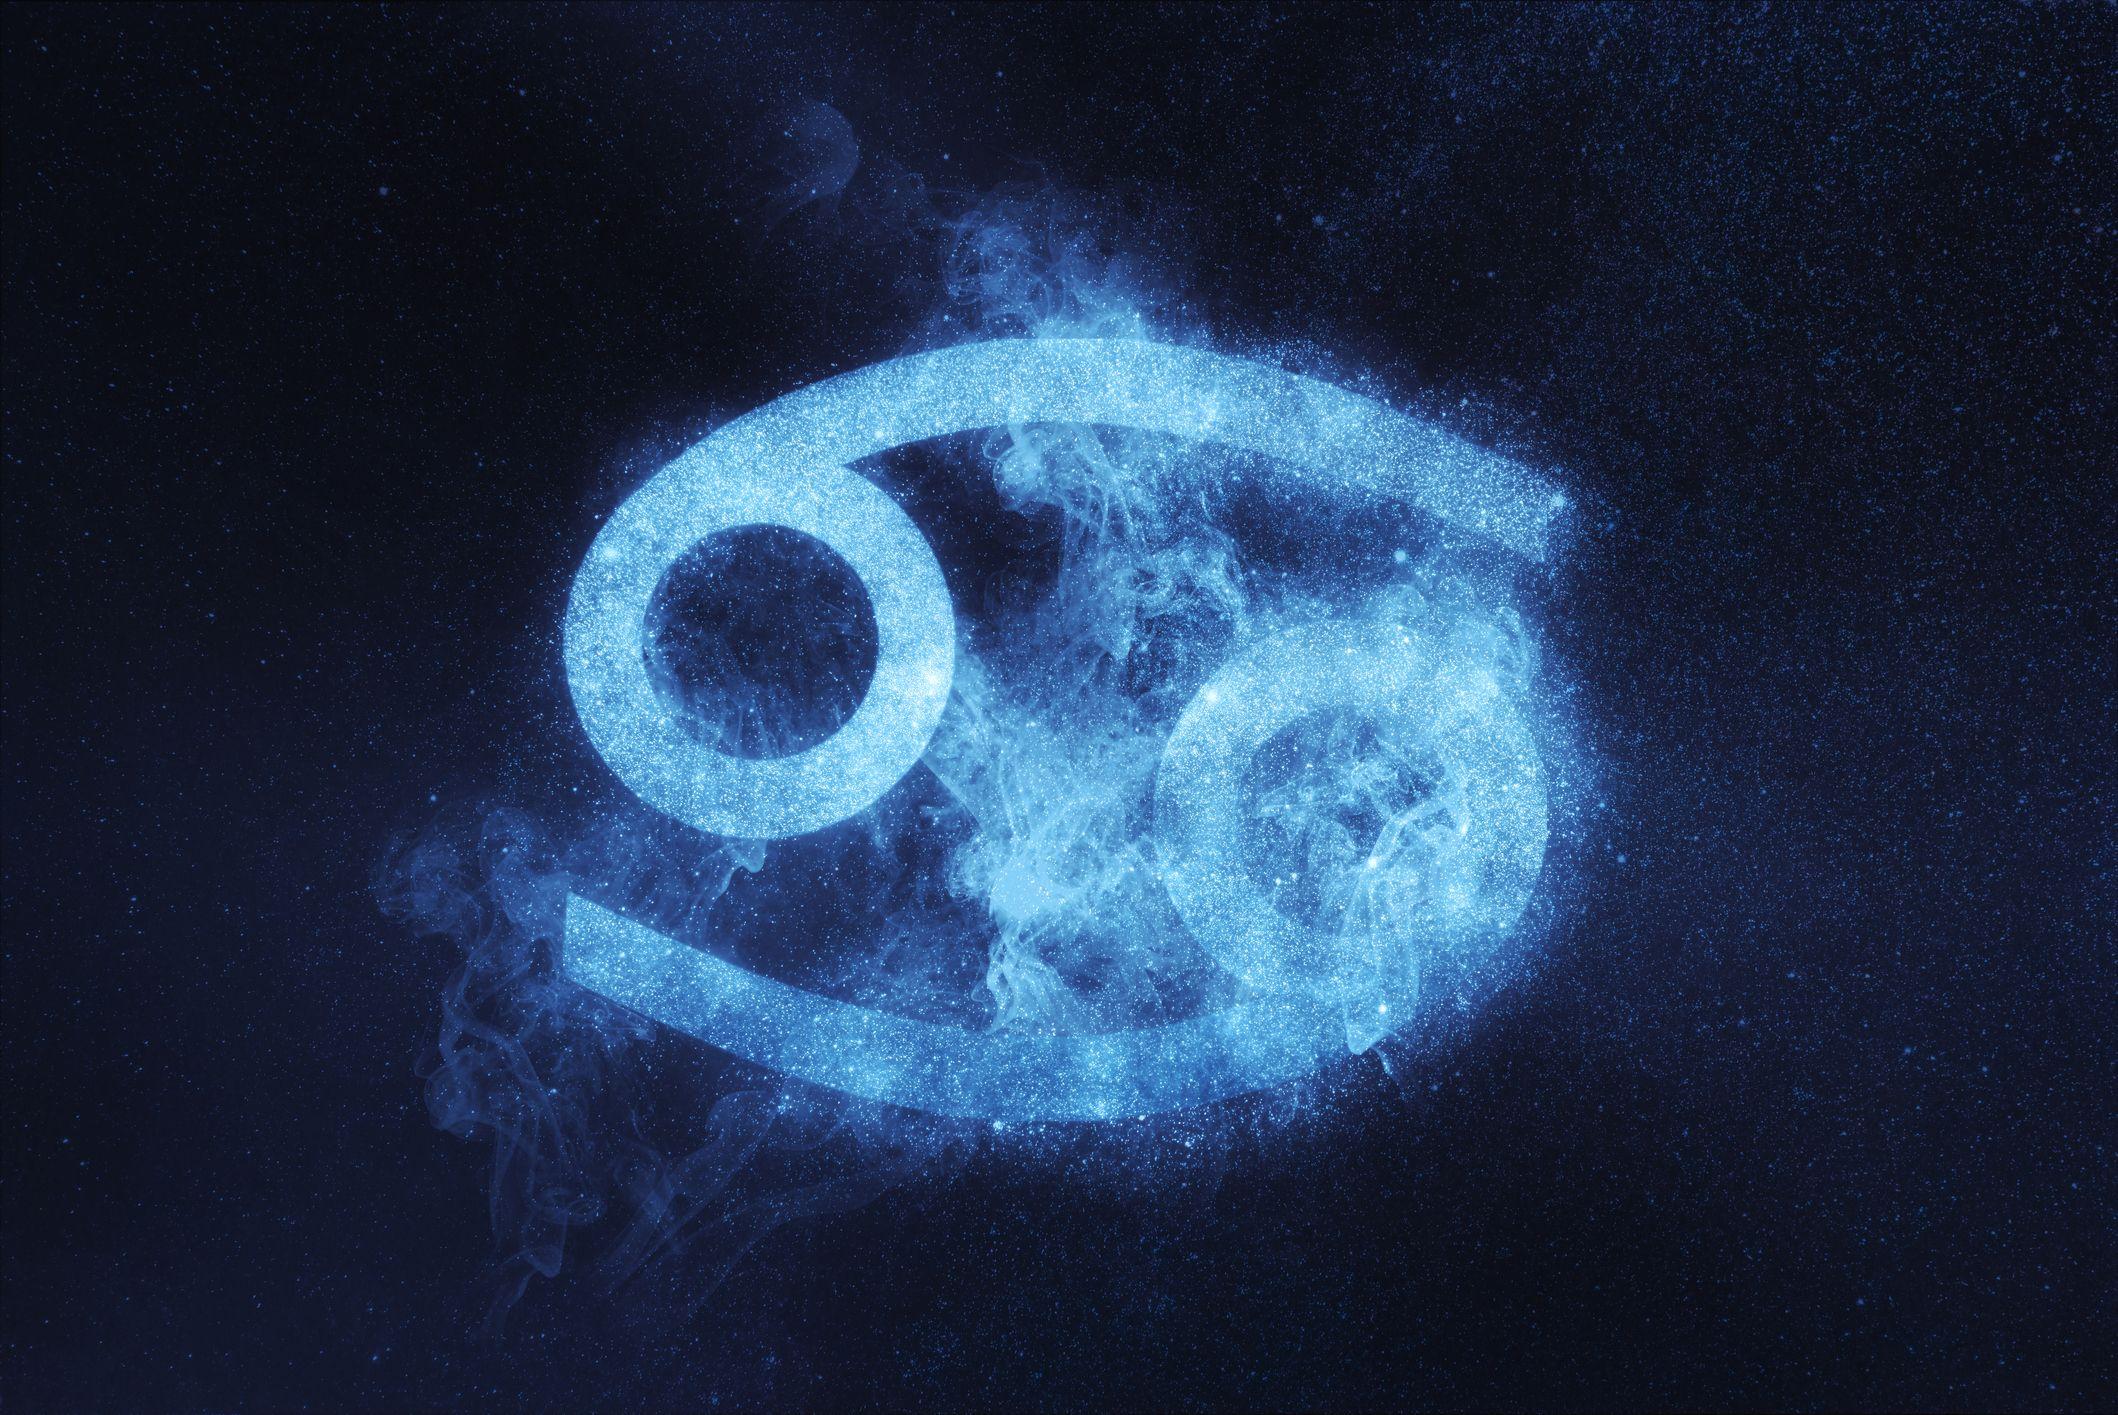 Horoscop Minerva 12-18 aprilie 2021 RAC